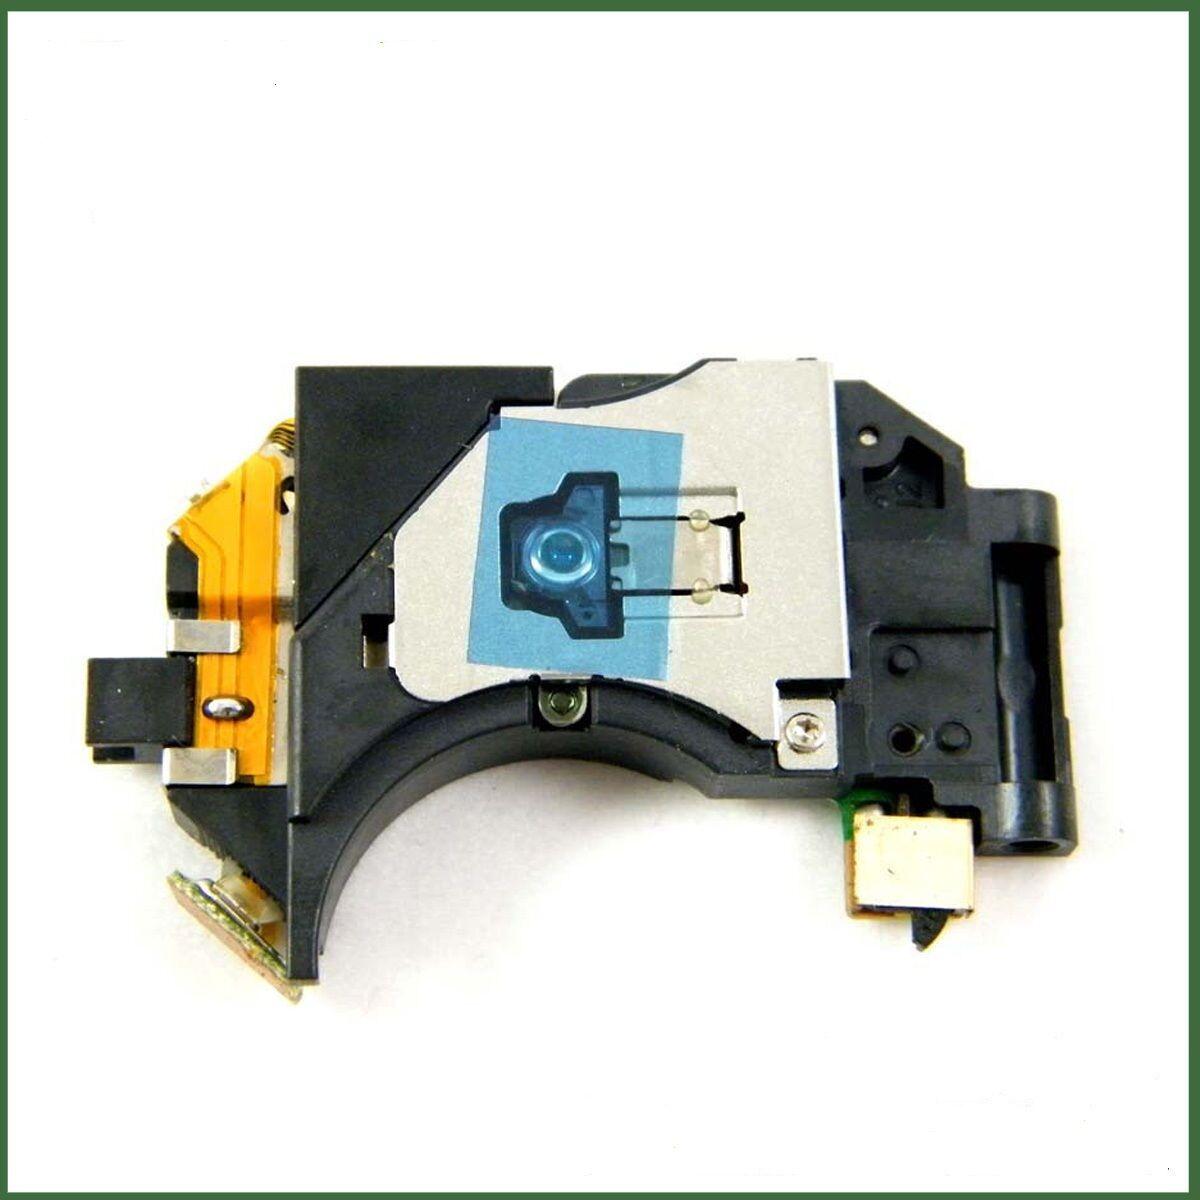 SPU-3170 laser and mechanism New PS2 slimline complete laser assembly